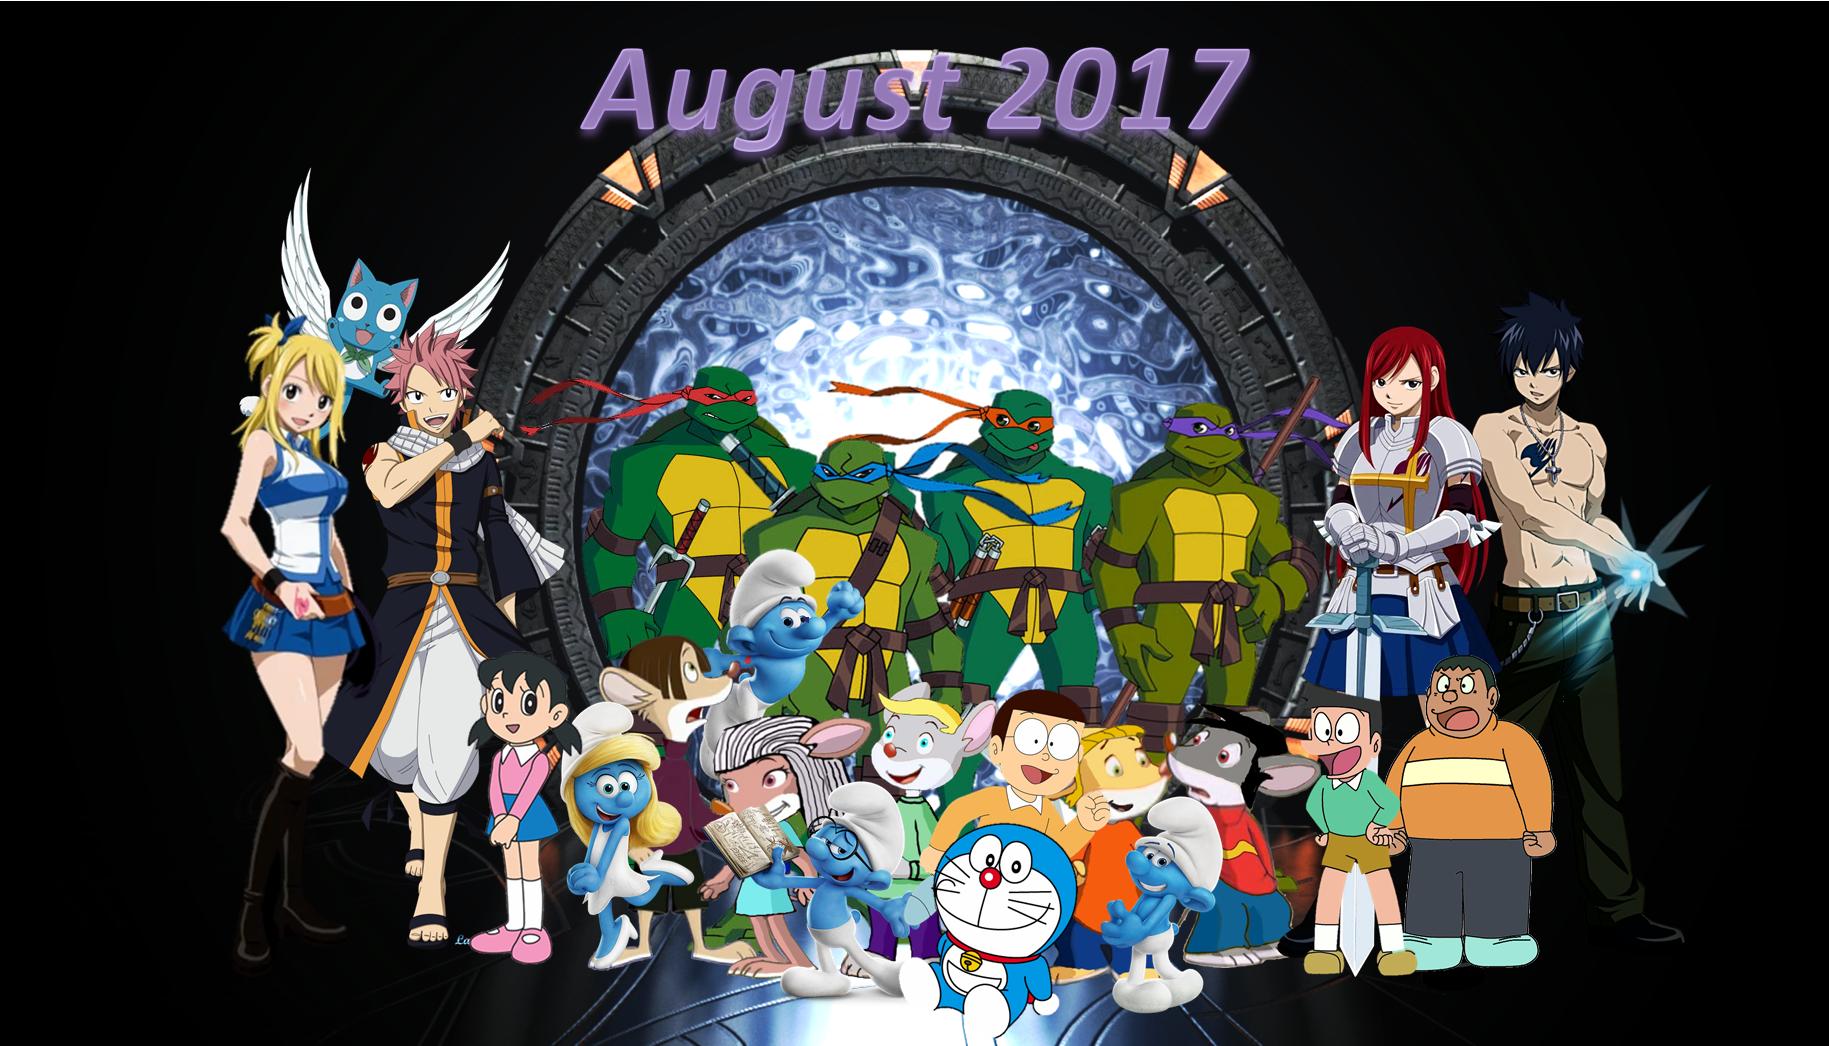 August 2017 by vasilia95